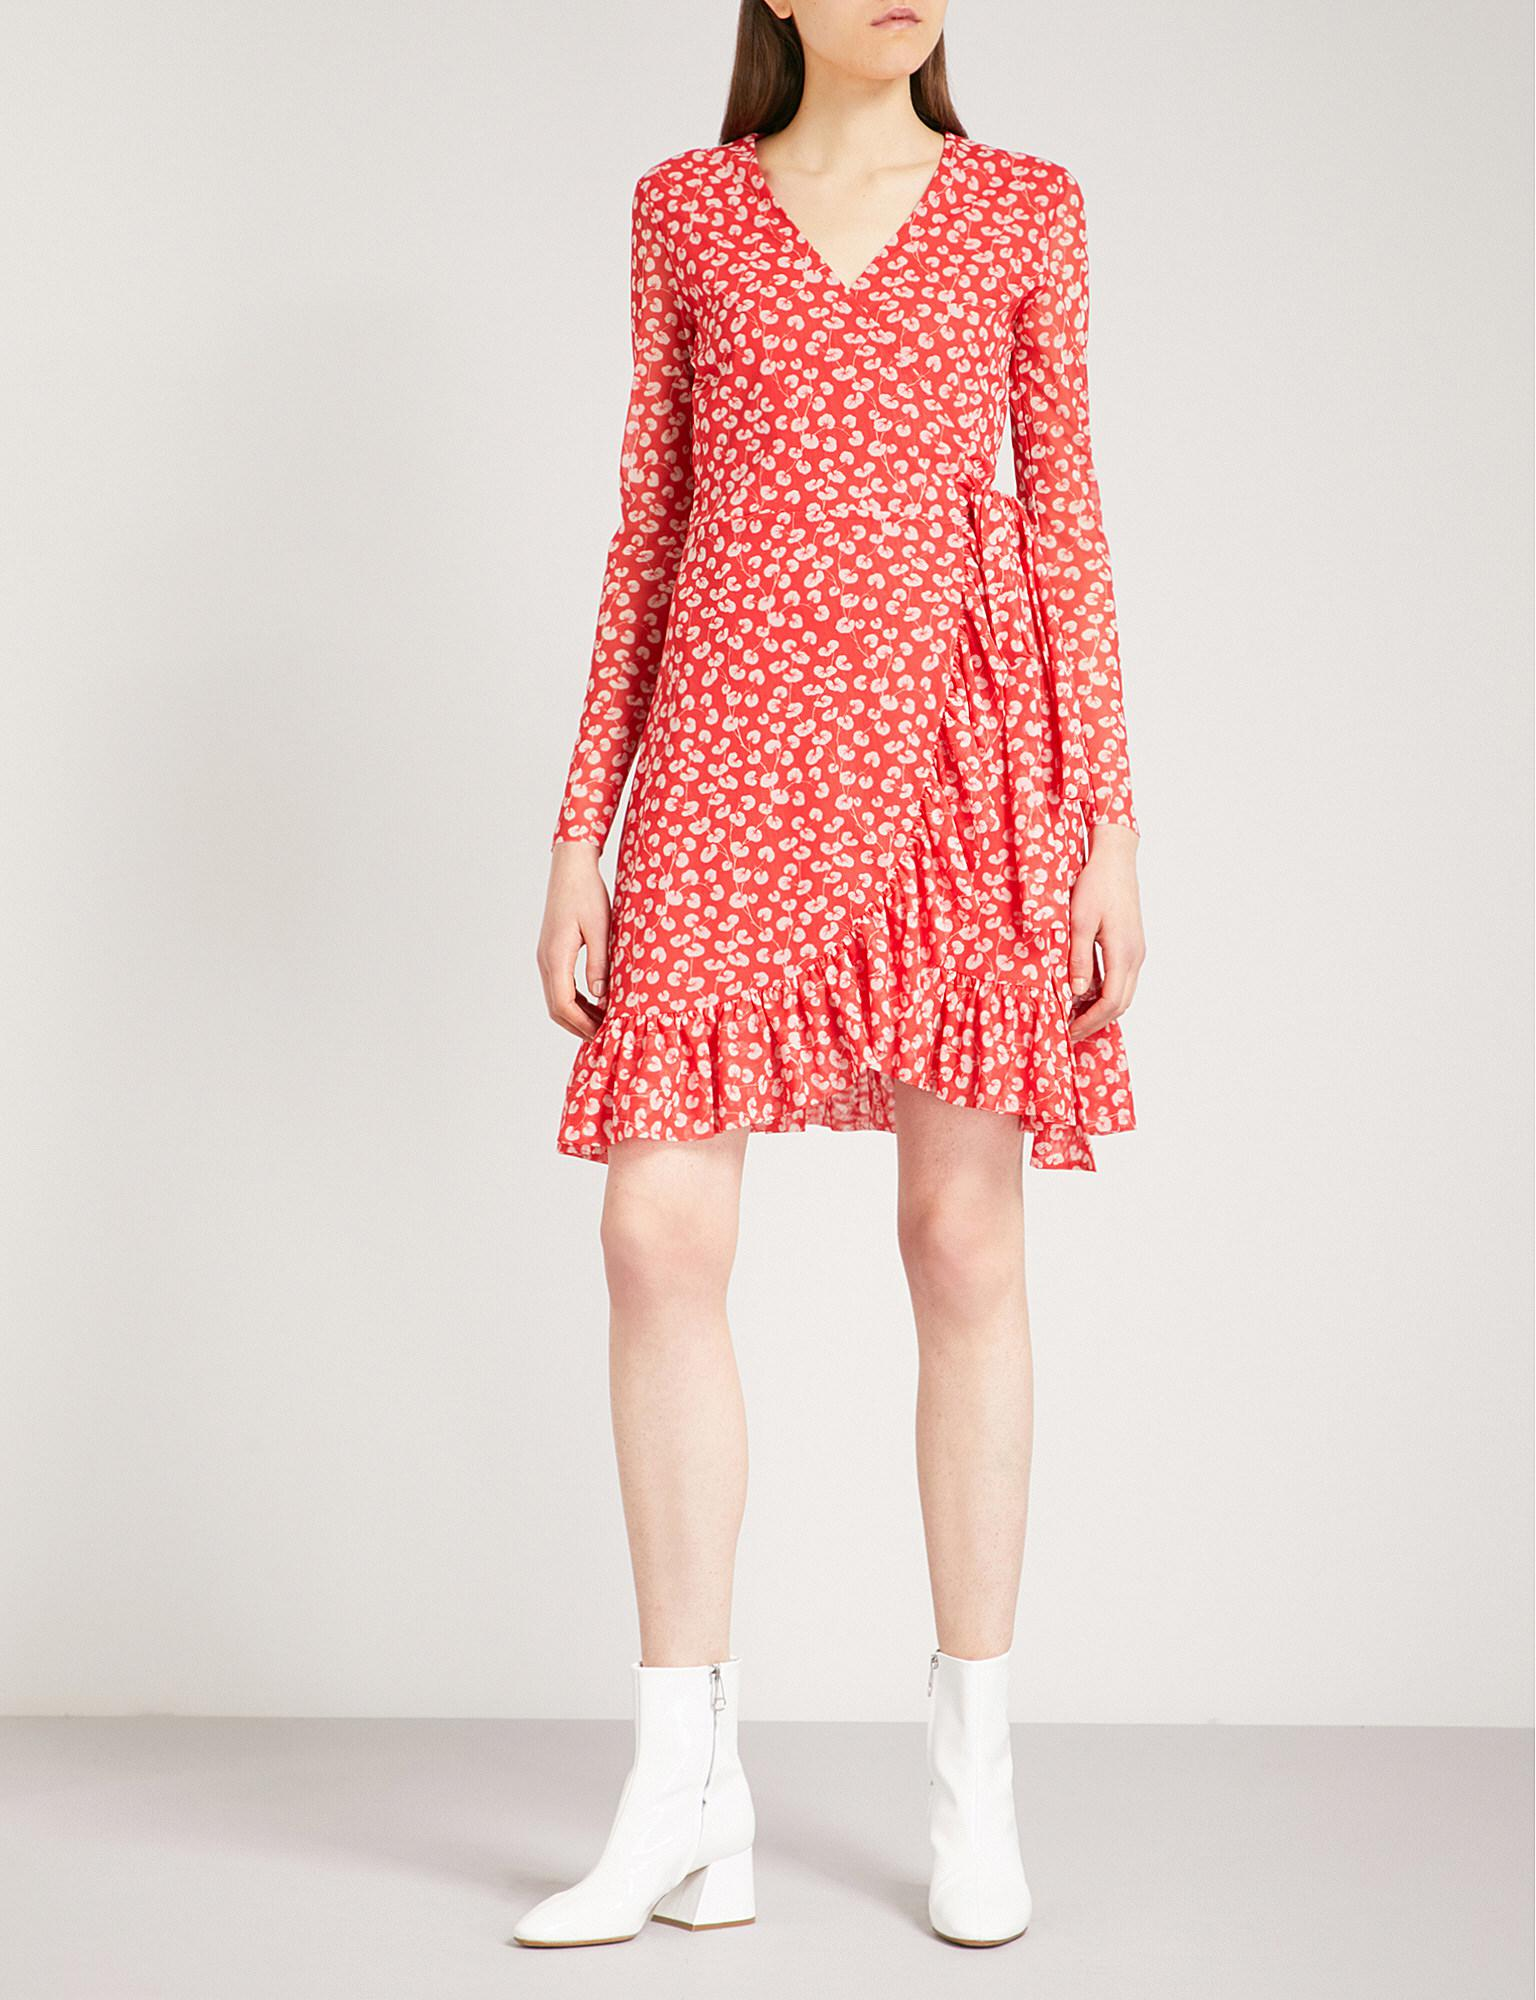 4c71ef9dc0 Ganni Tilden Mesh Wrap Dress in Red - Lyst